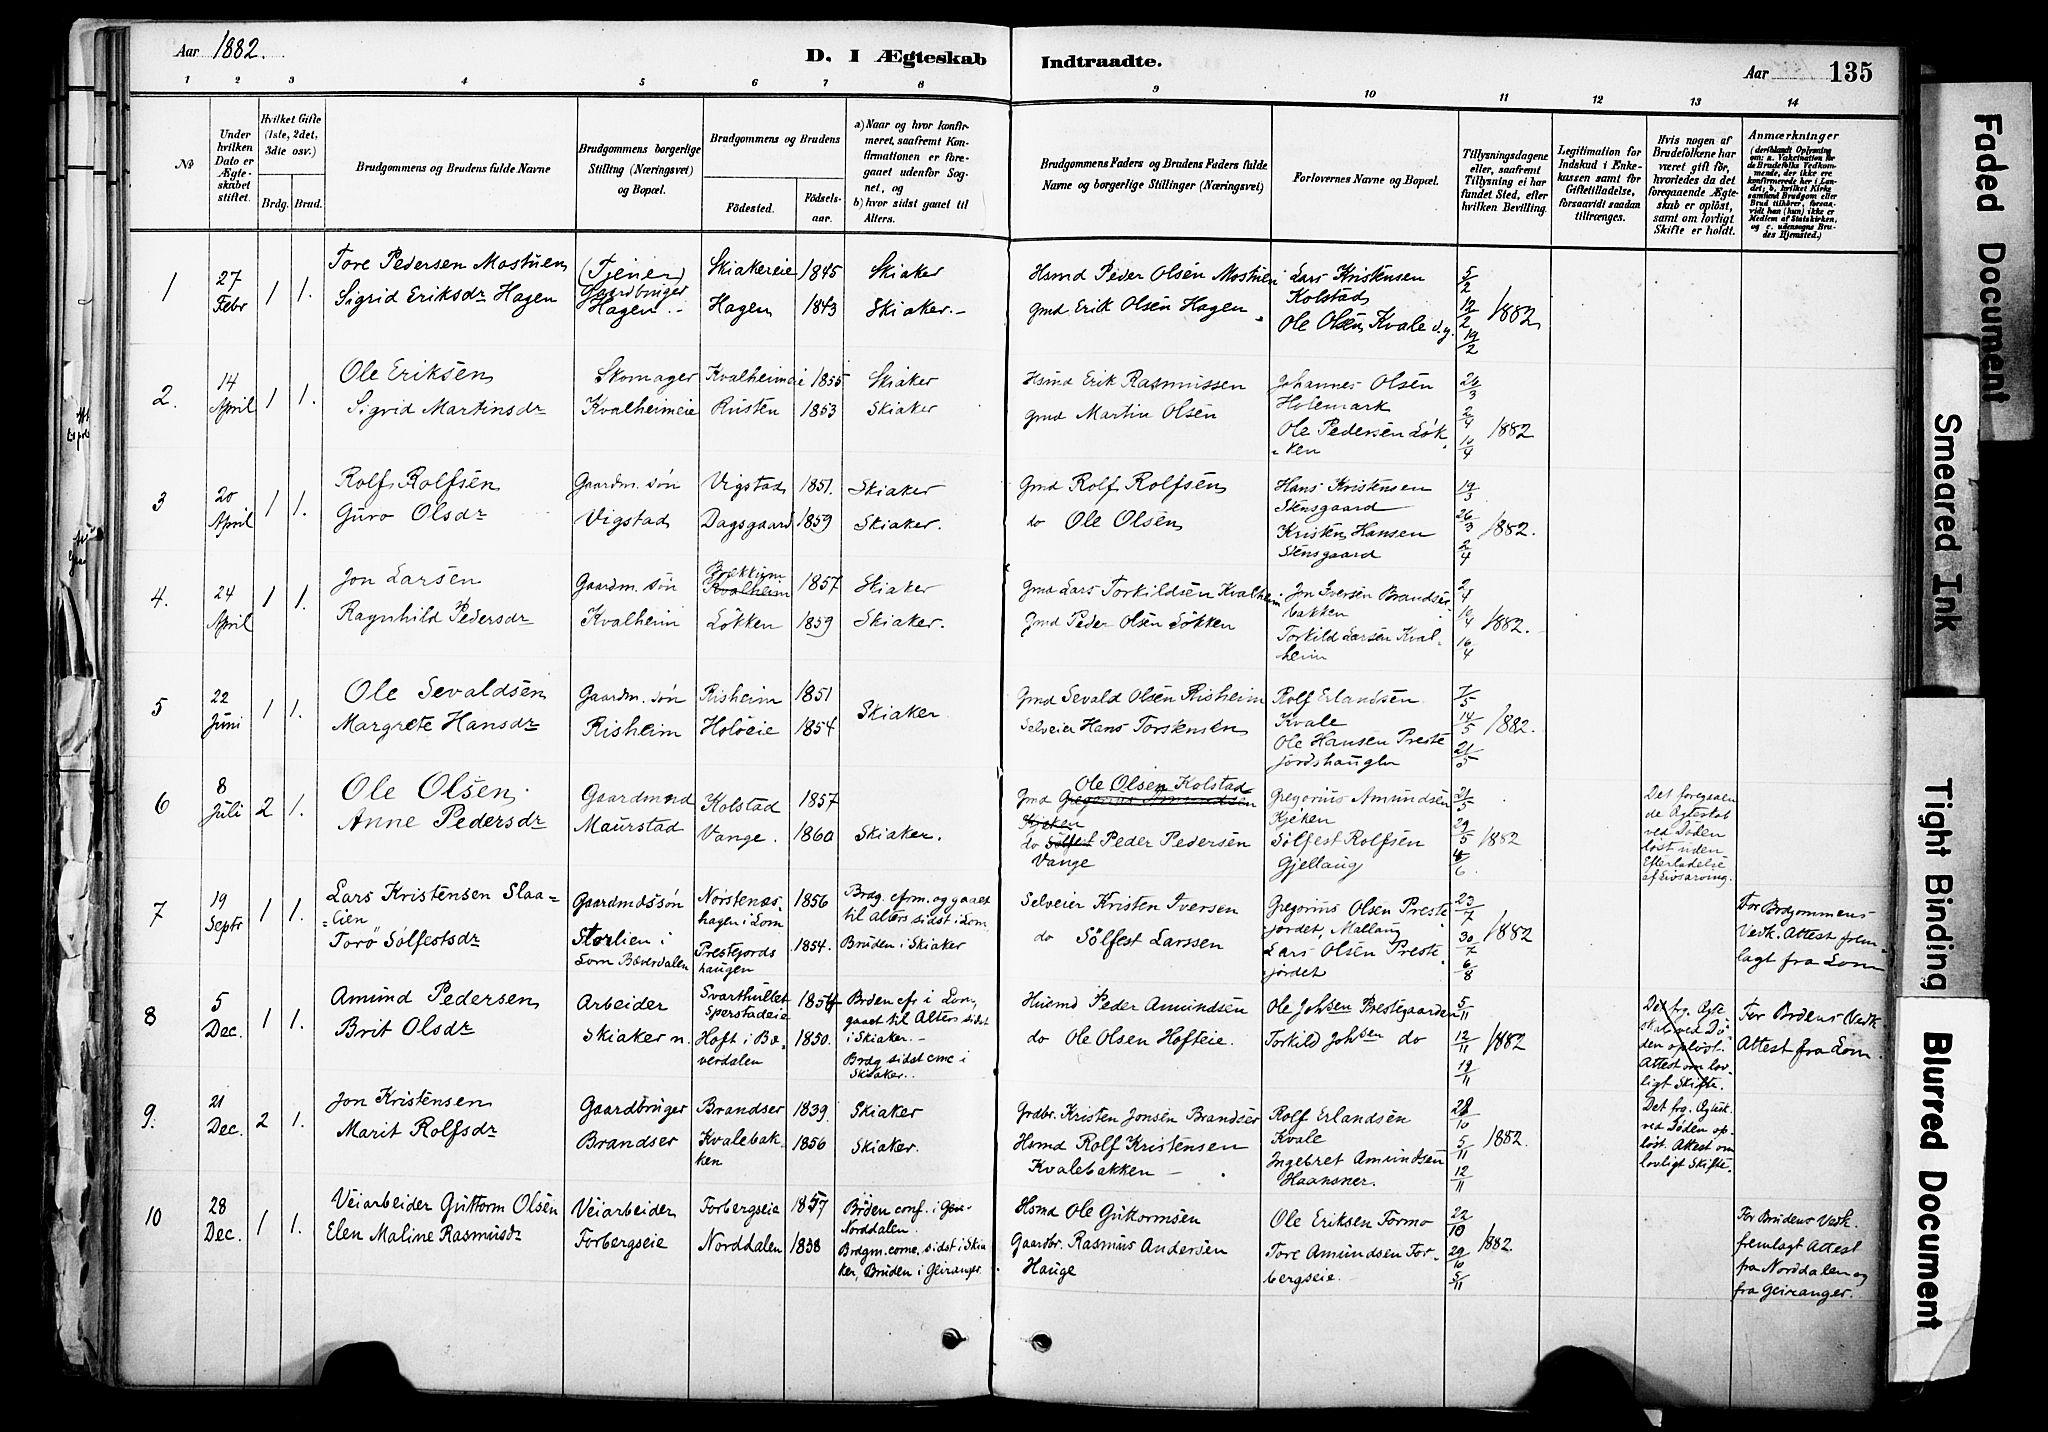 SAH, Skjåk prestekontor, Ministerialbok nr. 3, 1880-1907, s. 135